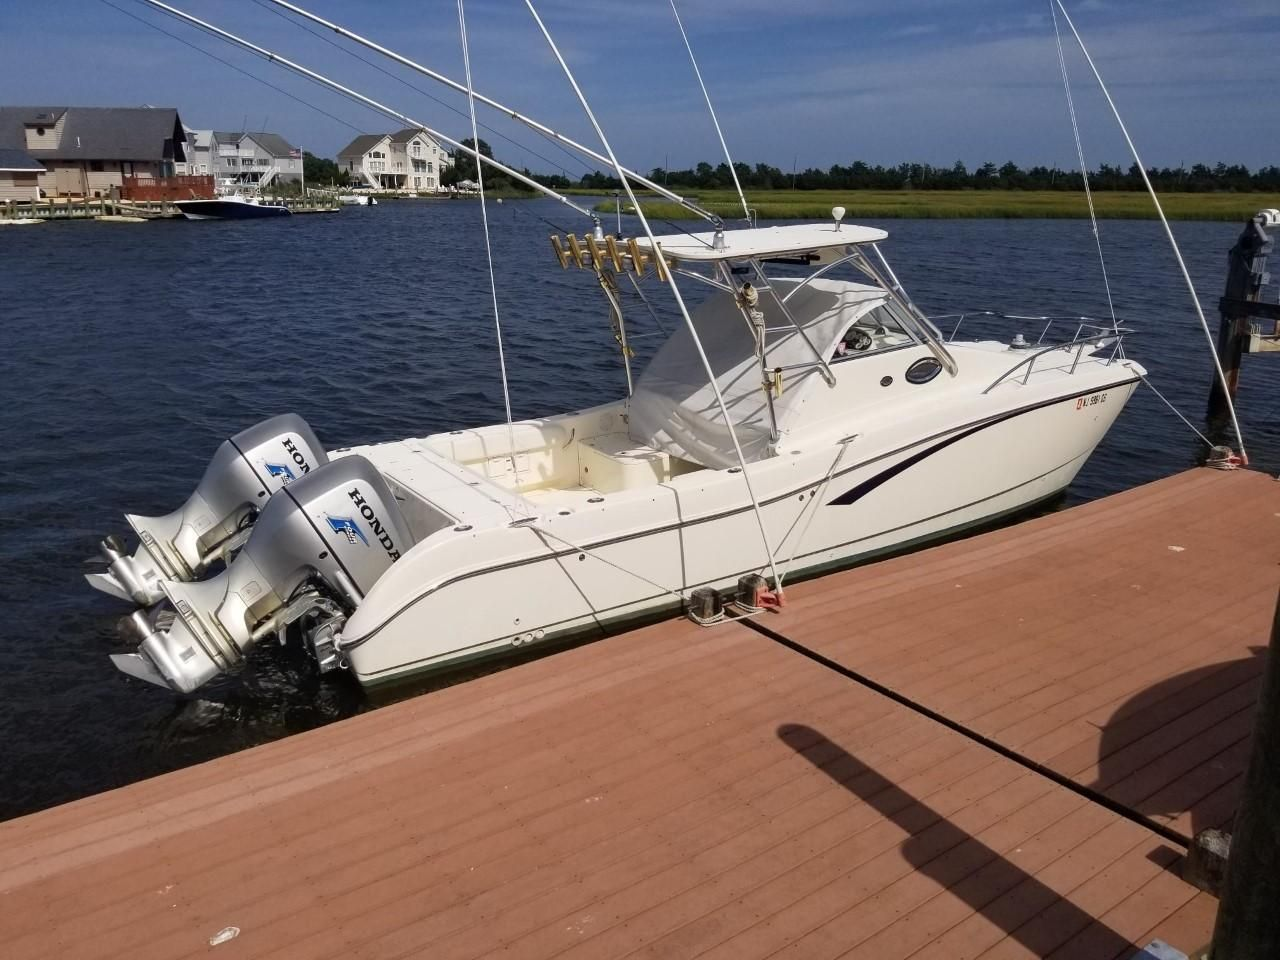 2003 Used World Cat 270 EC Power Catamaran Boat For Sale